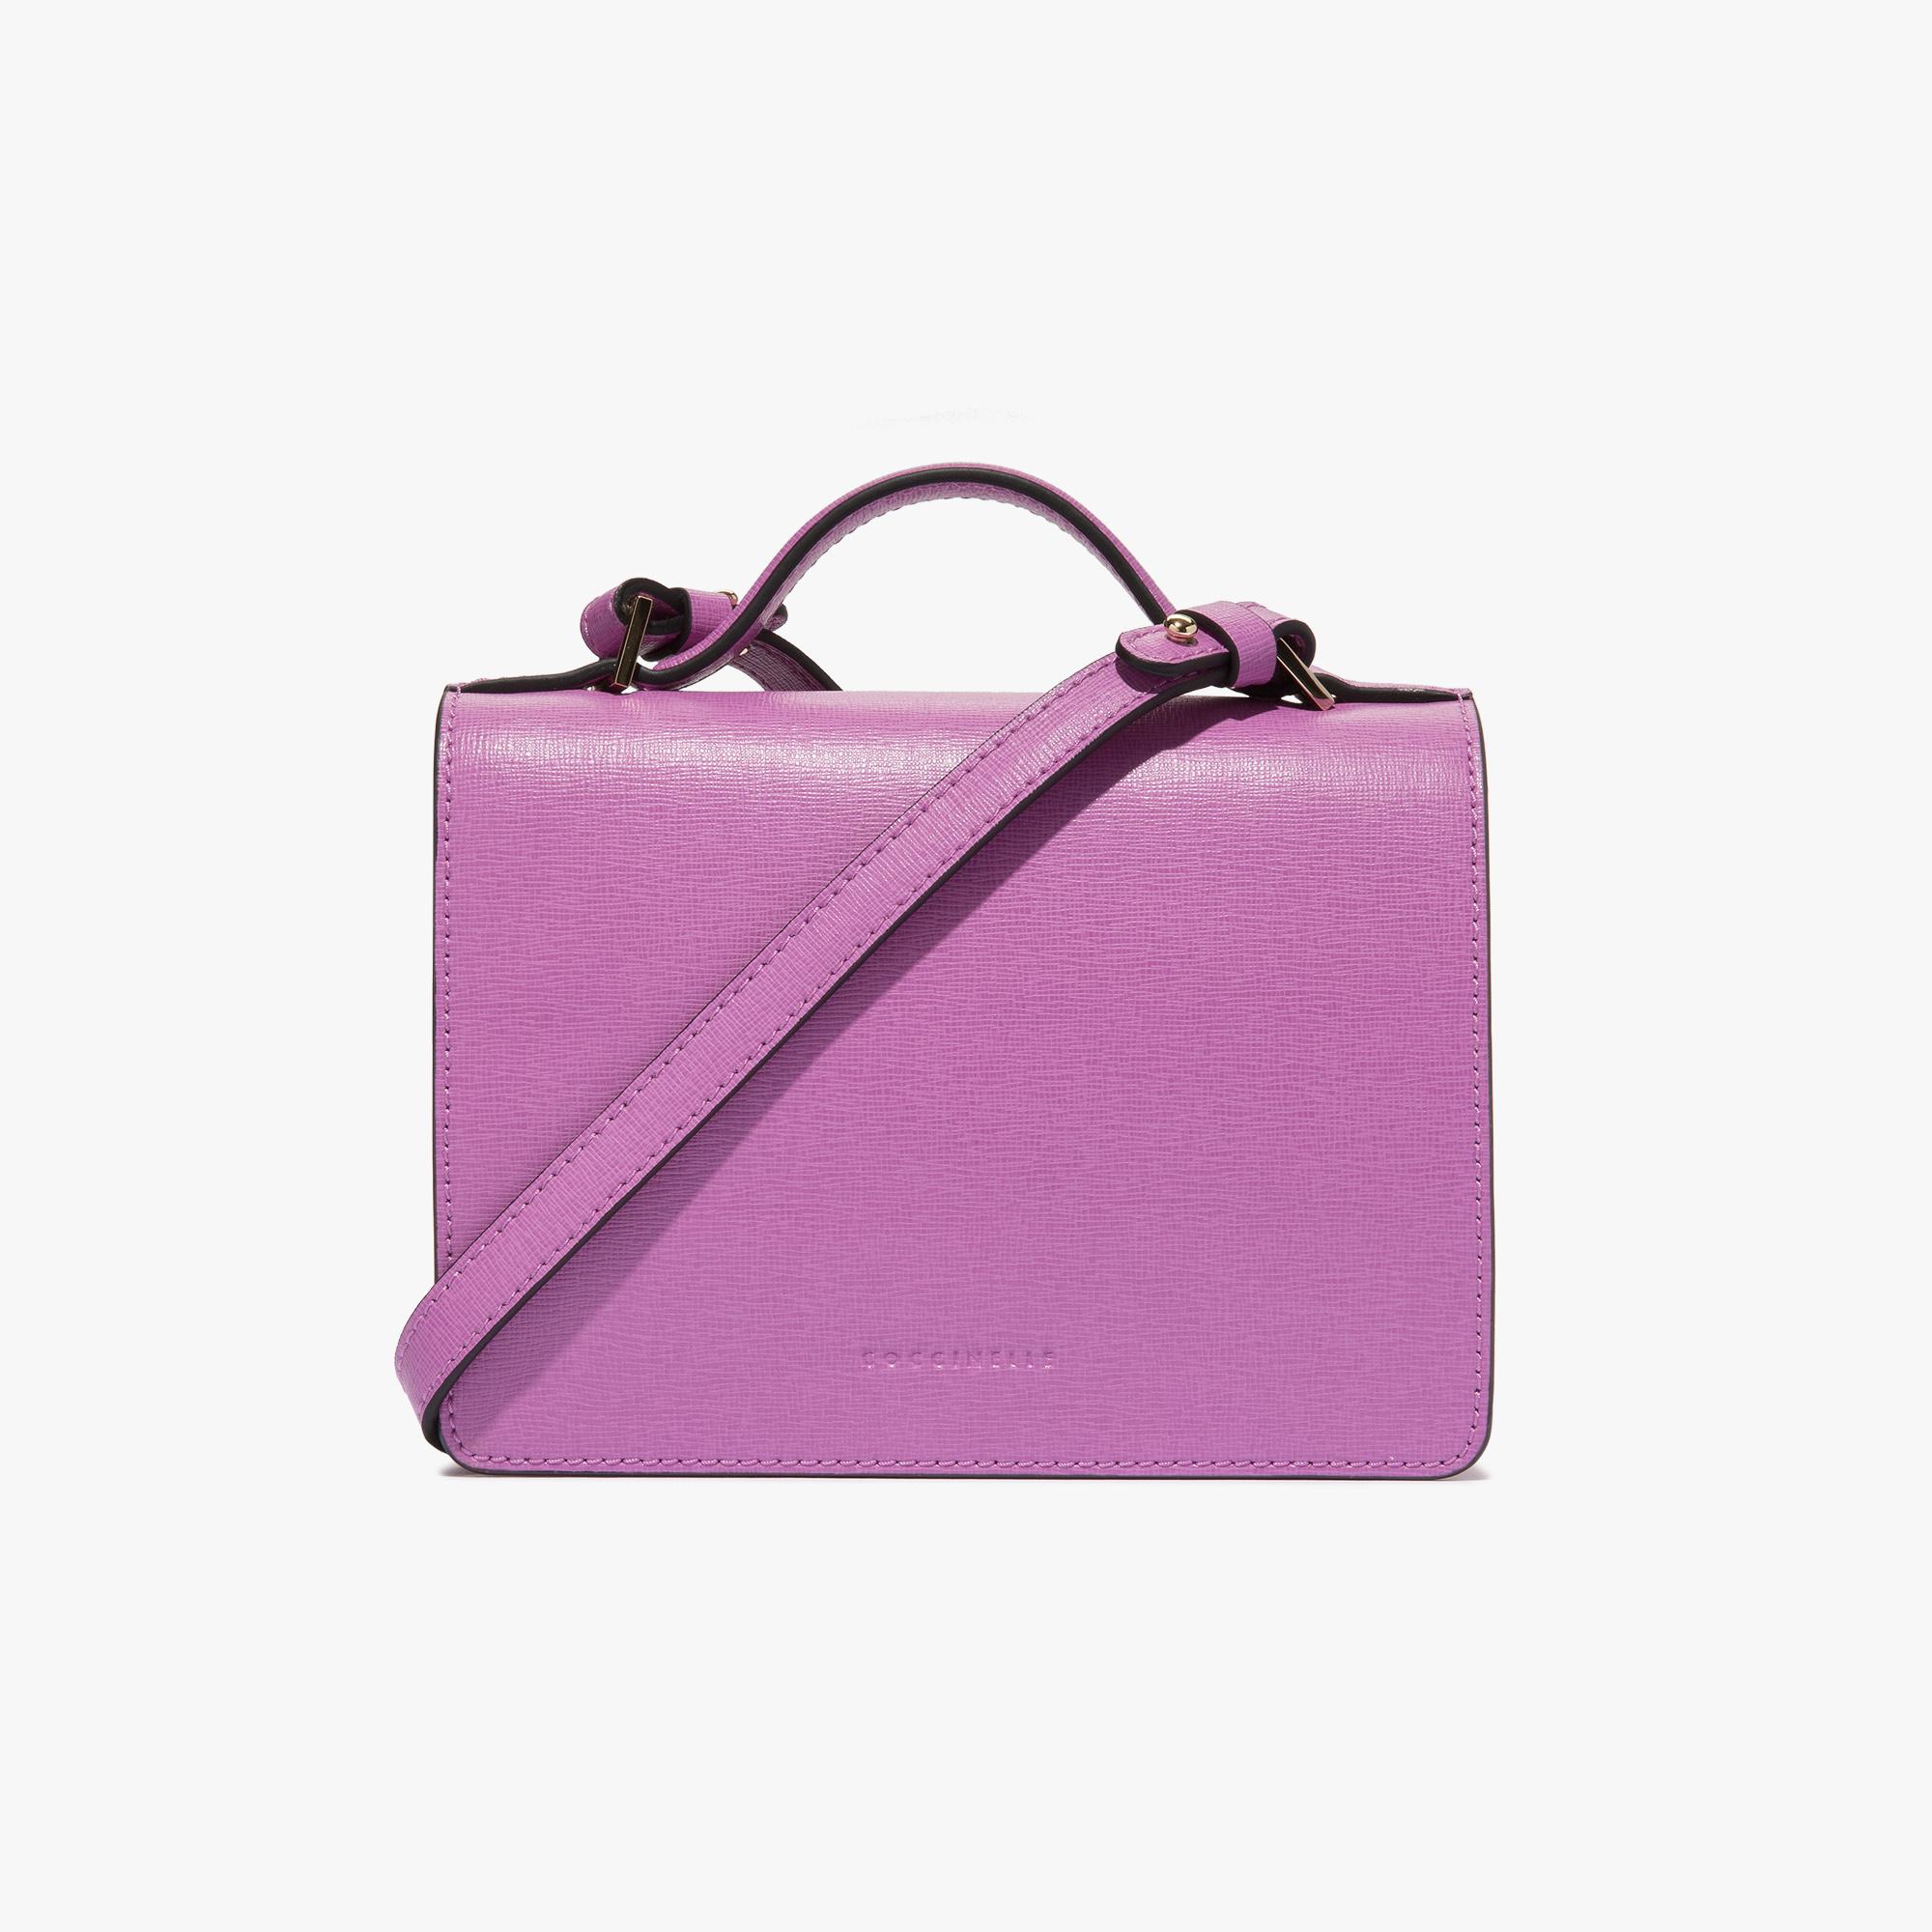 Coccinelle Leather mini clutch